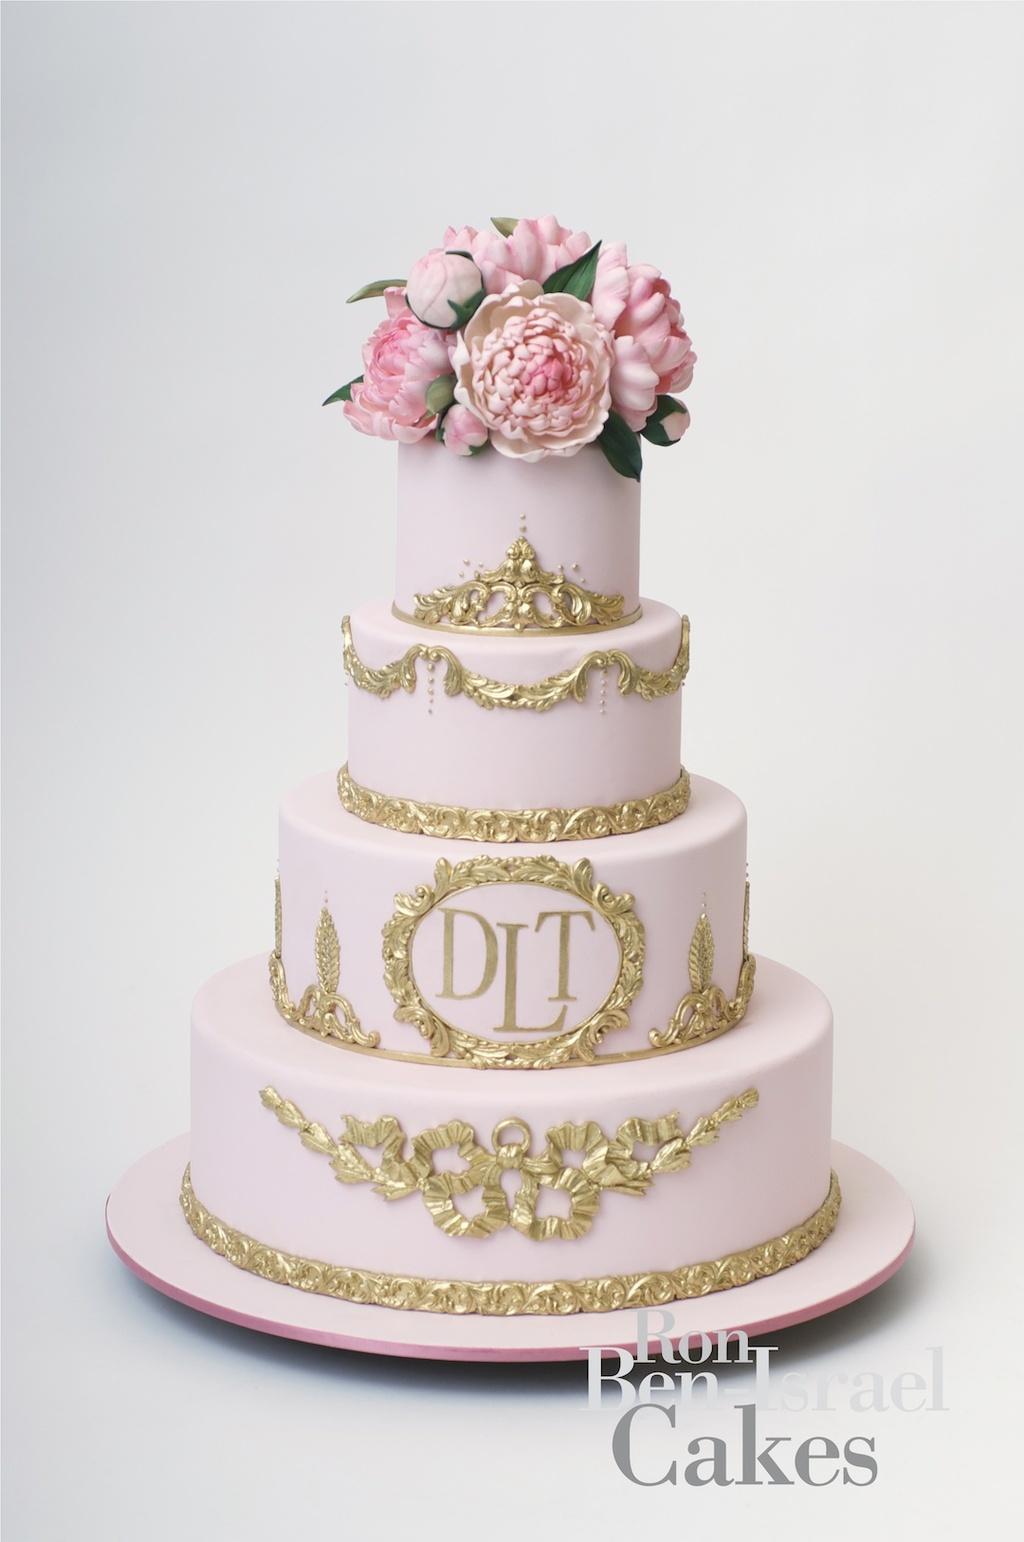 cake-inspiration-Ron-Ben-Isreal-wedding-cakes-light-pink-gold